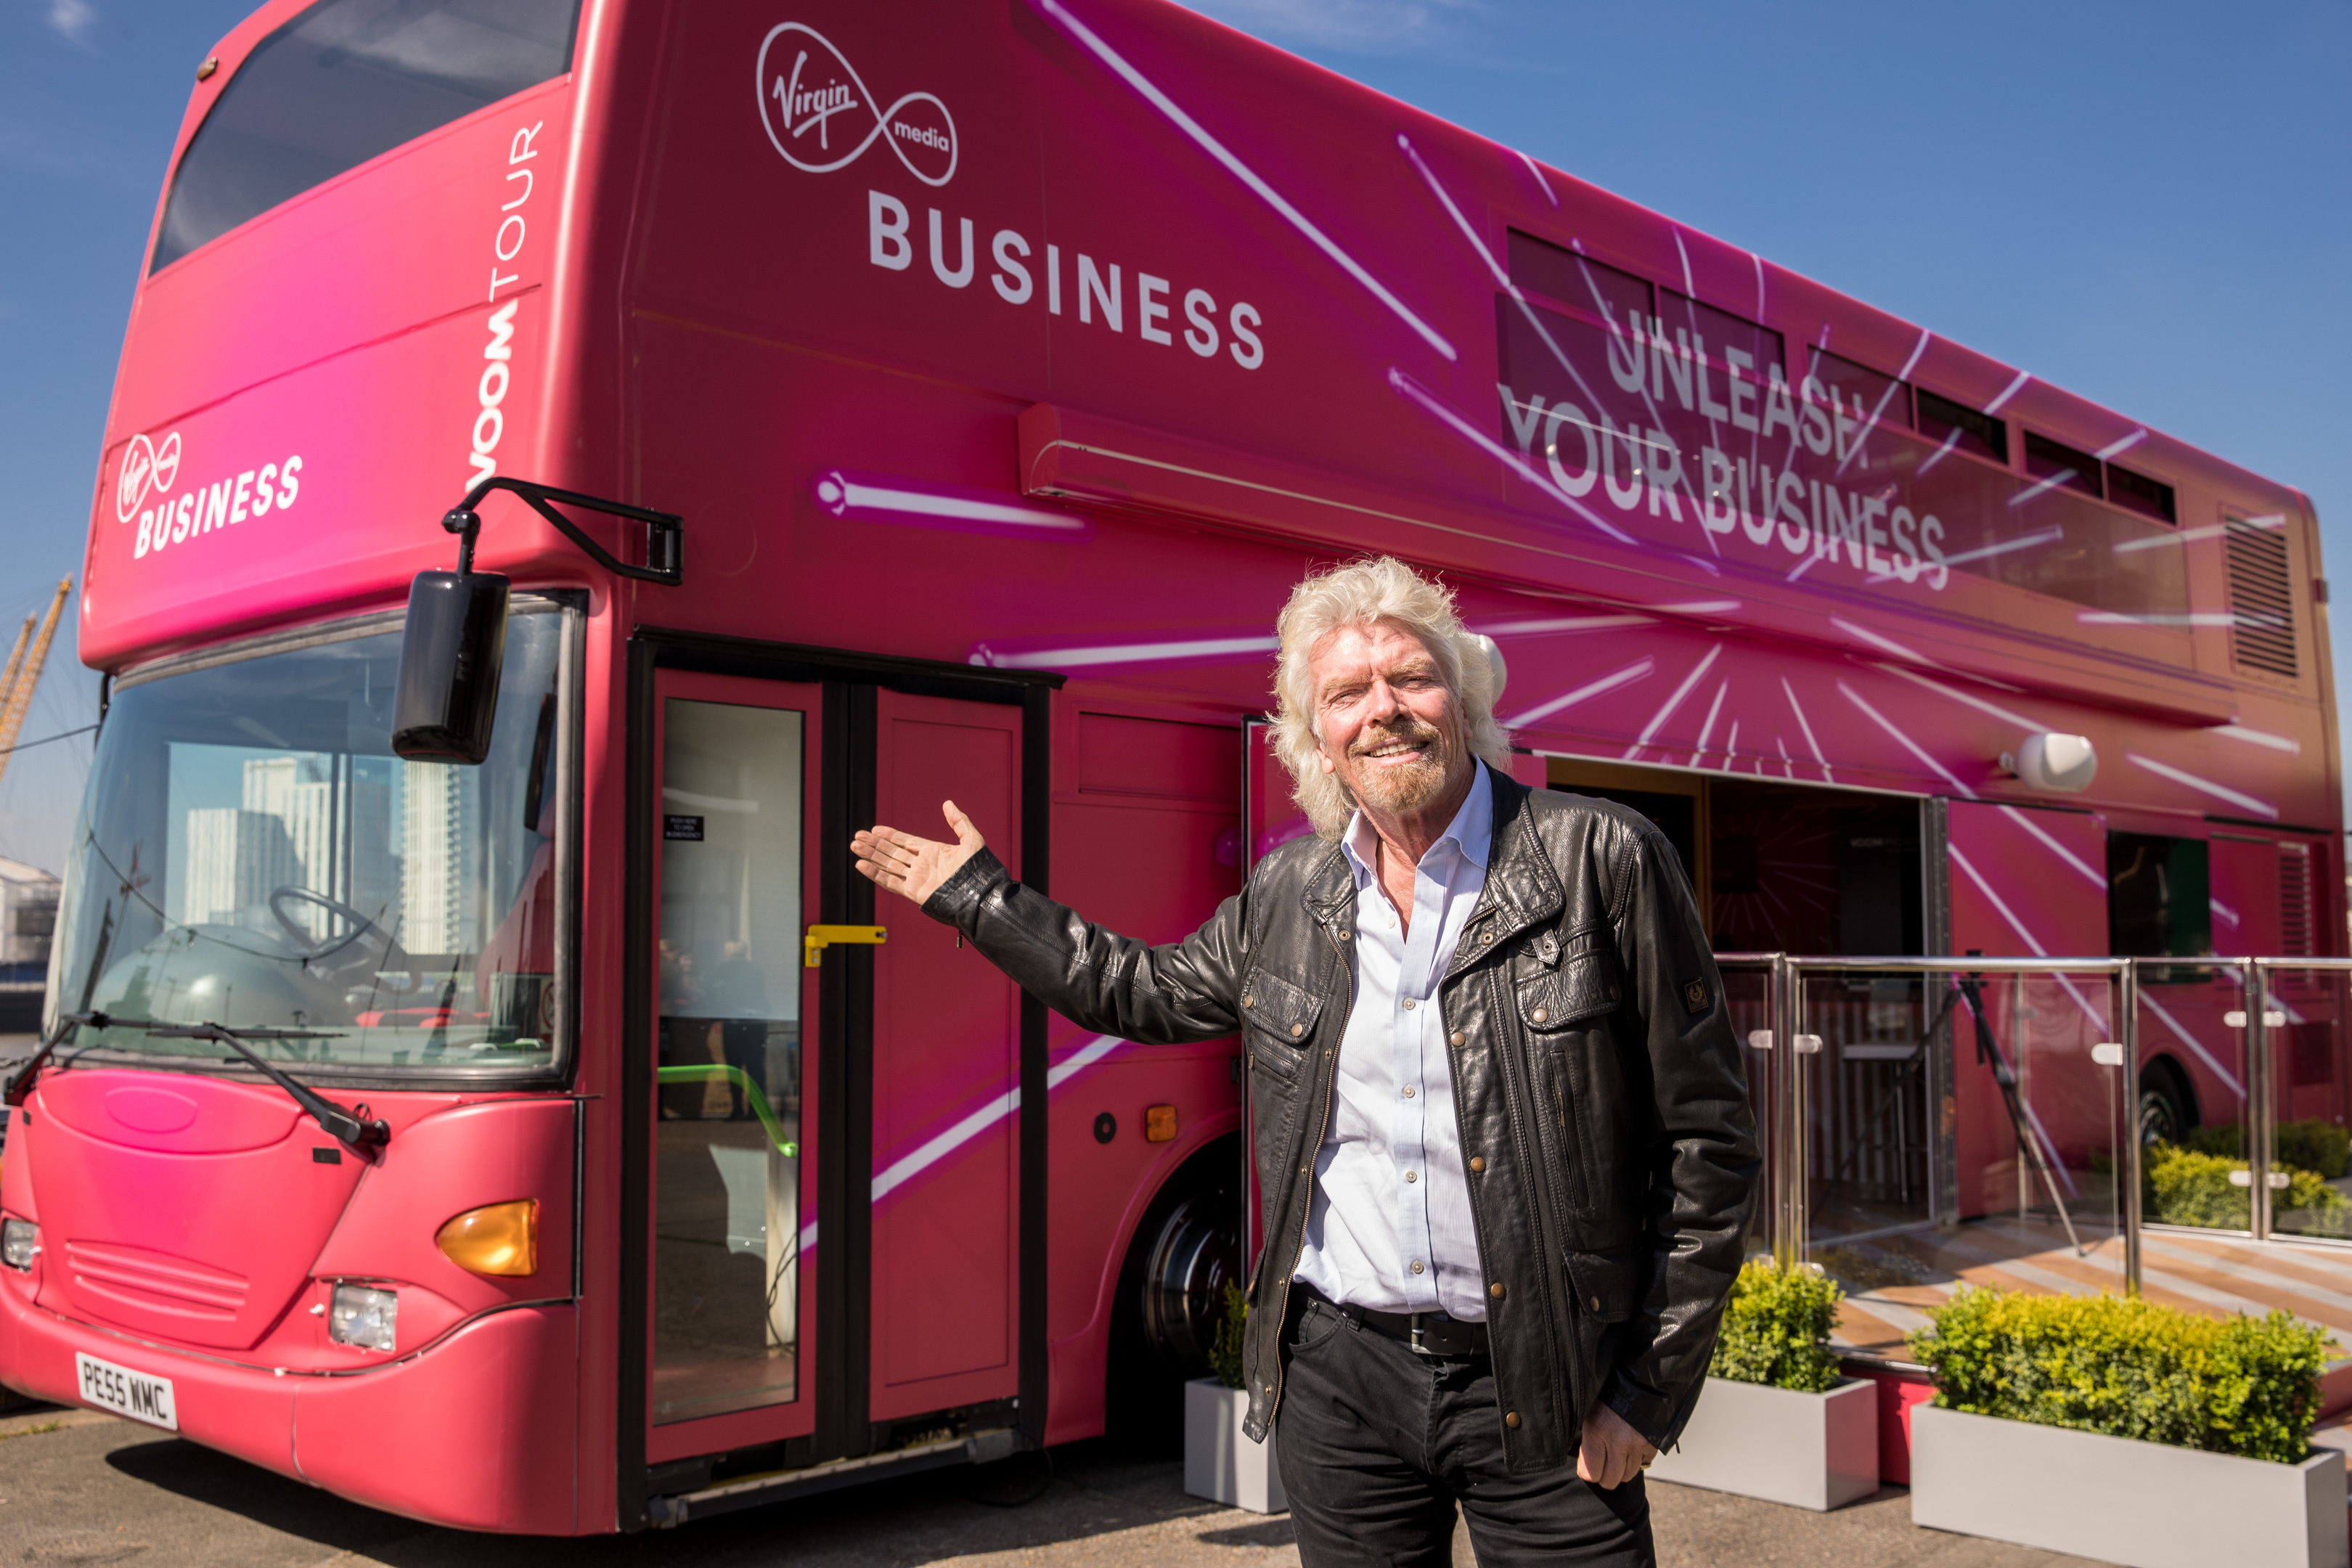 Sir Richard Branson with Virgin Media Business' Voom bus.